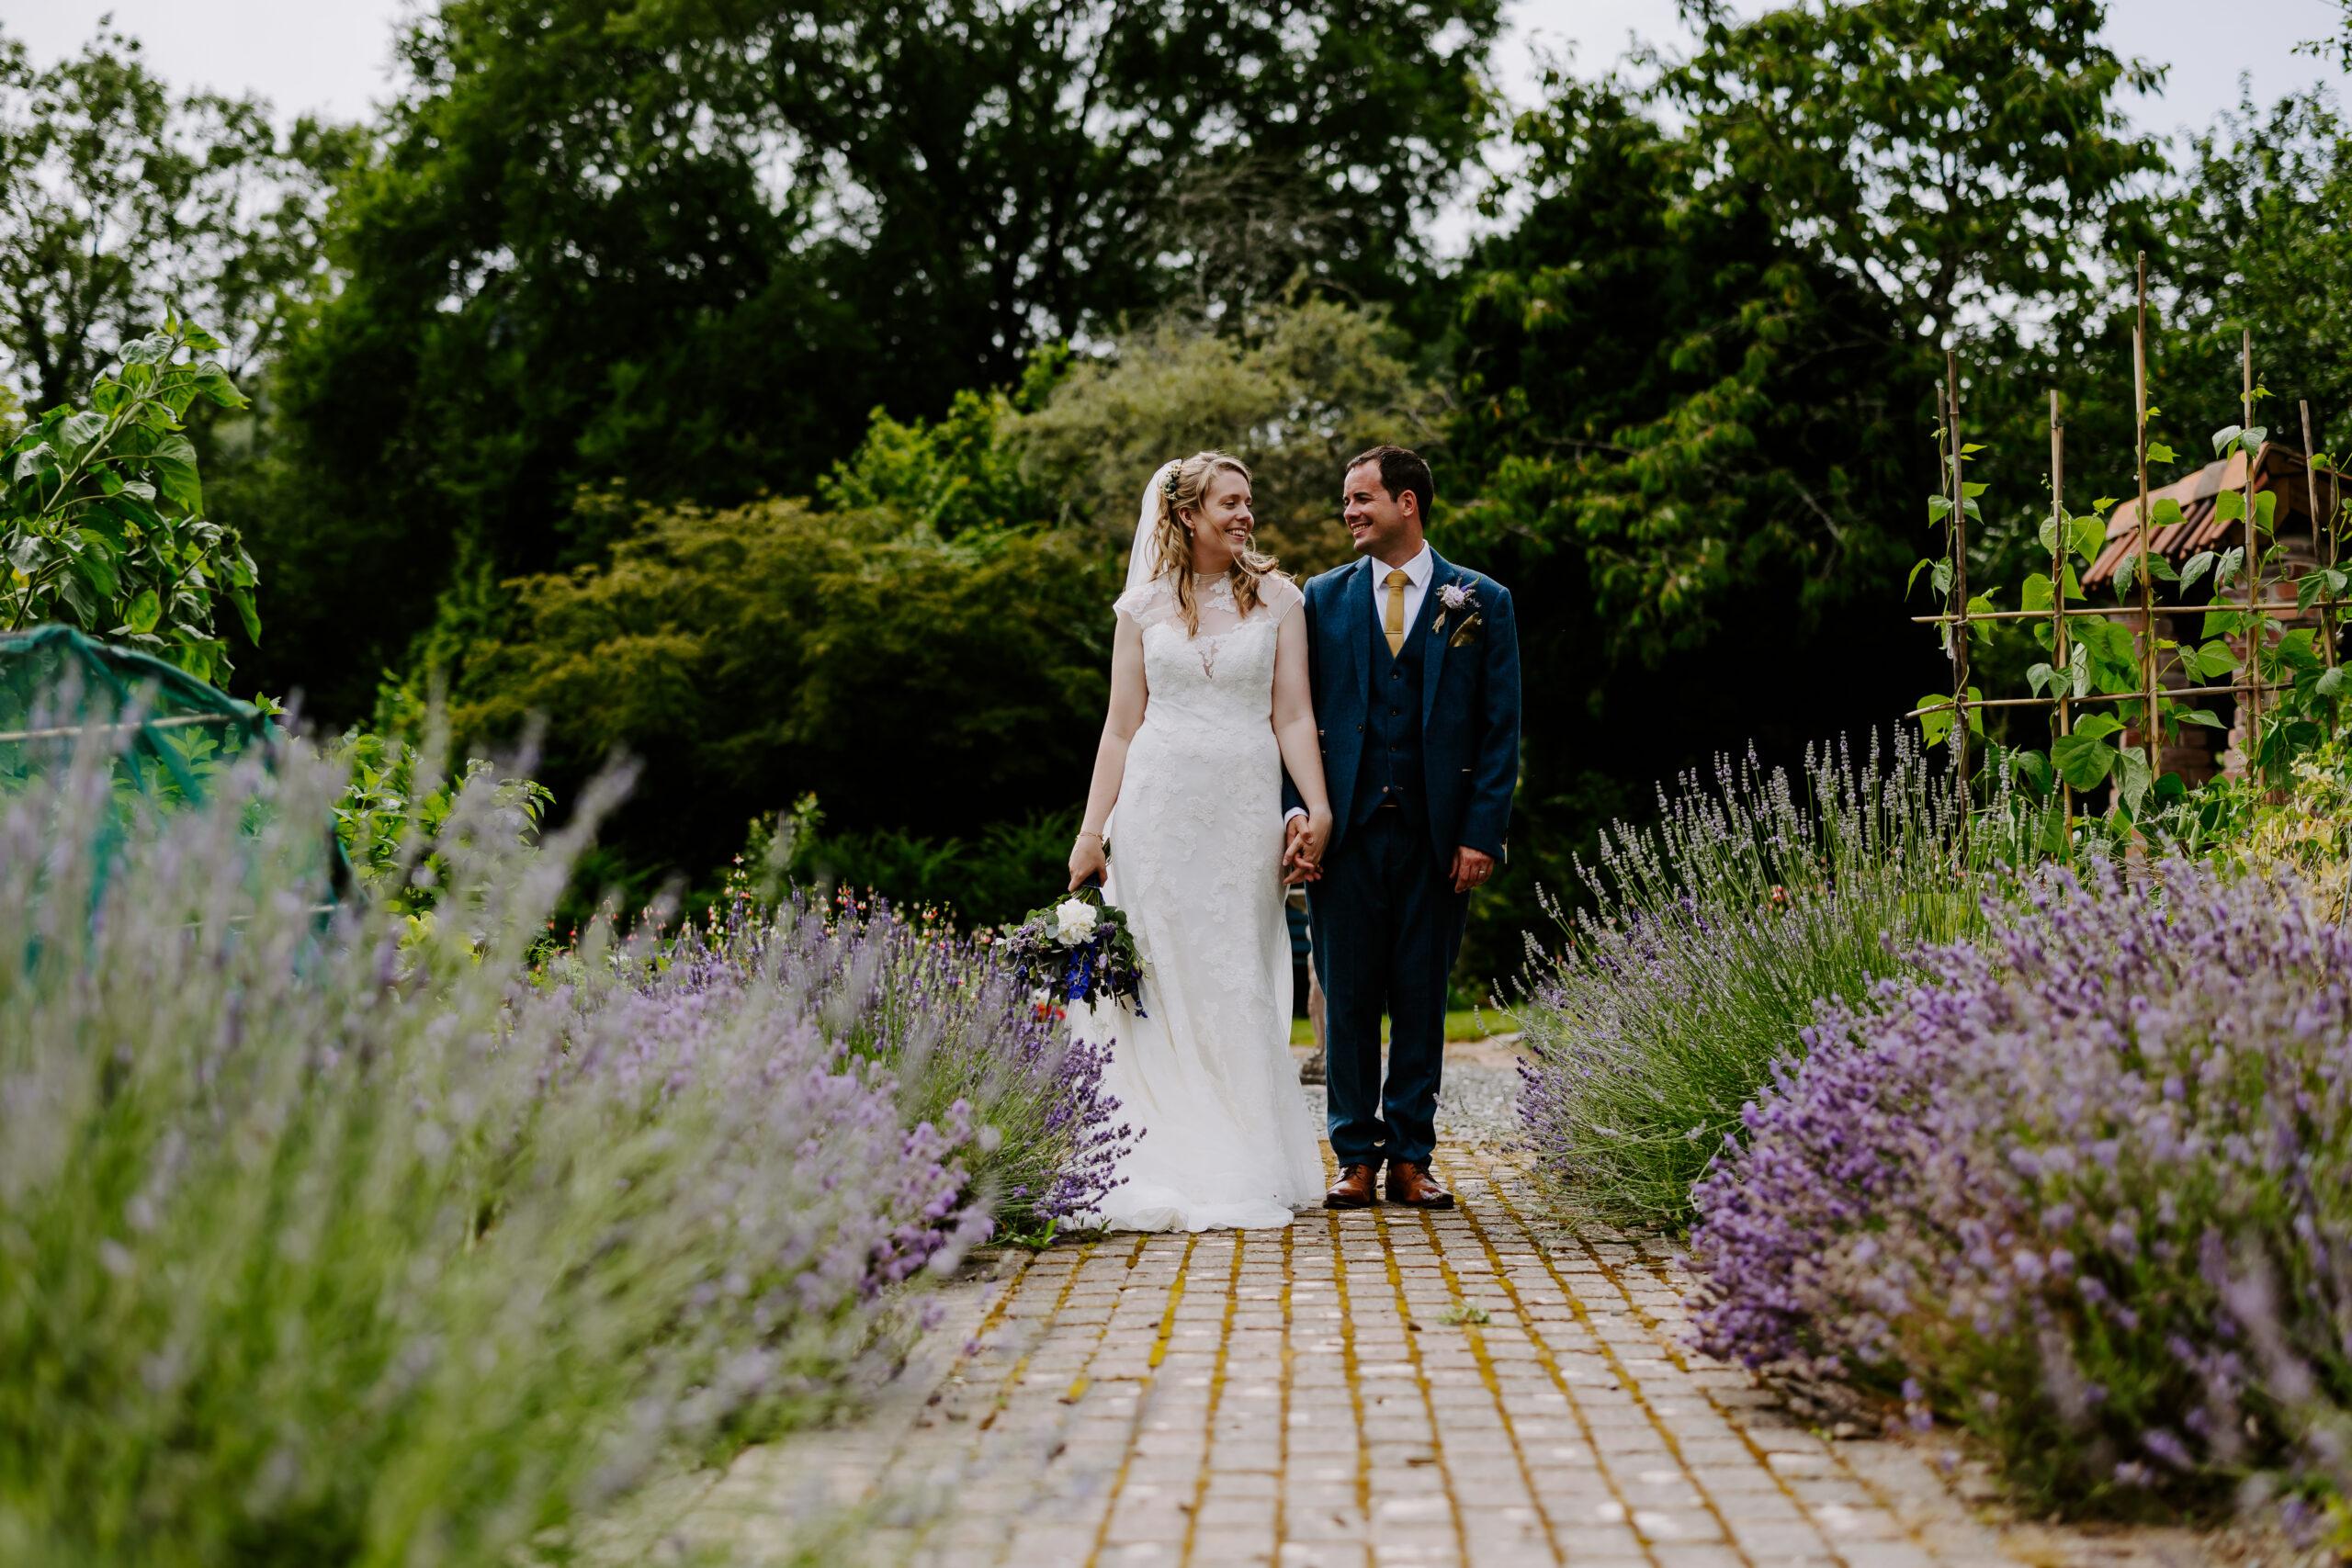 wedding day couple in gardens